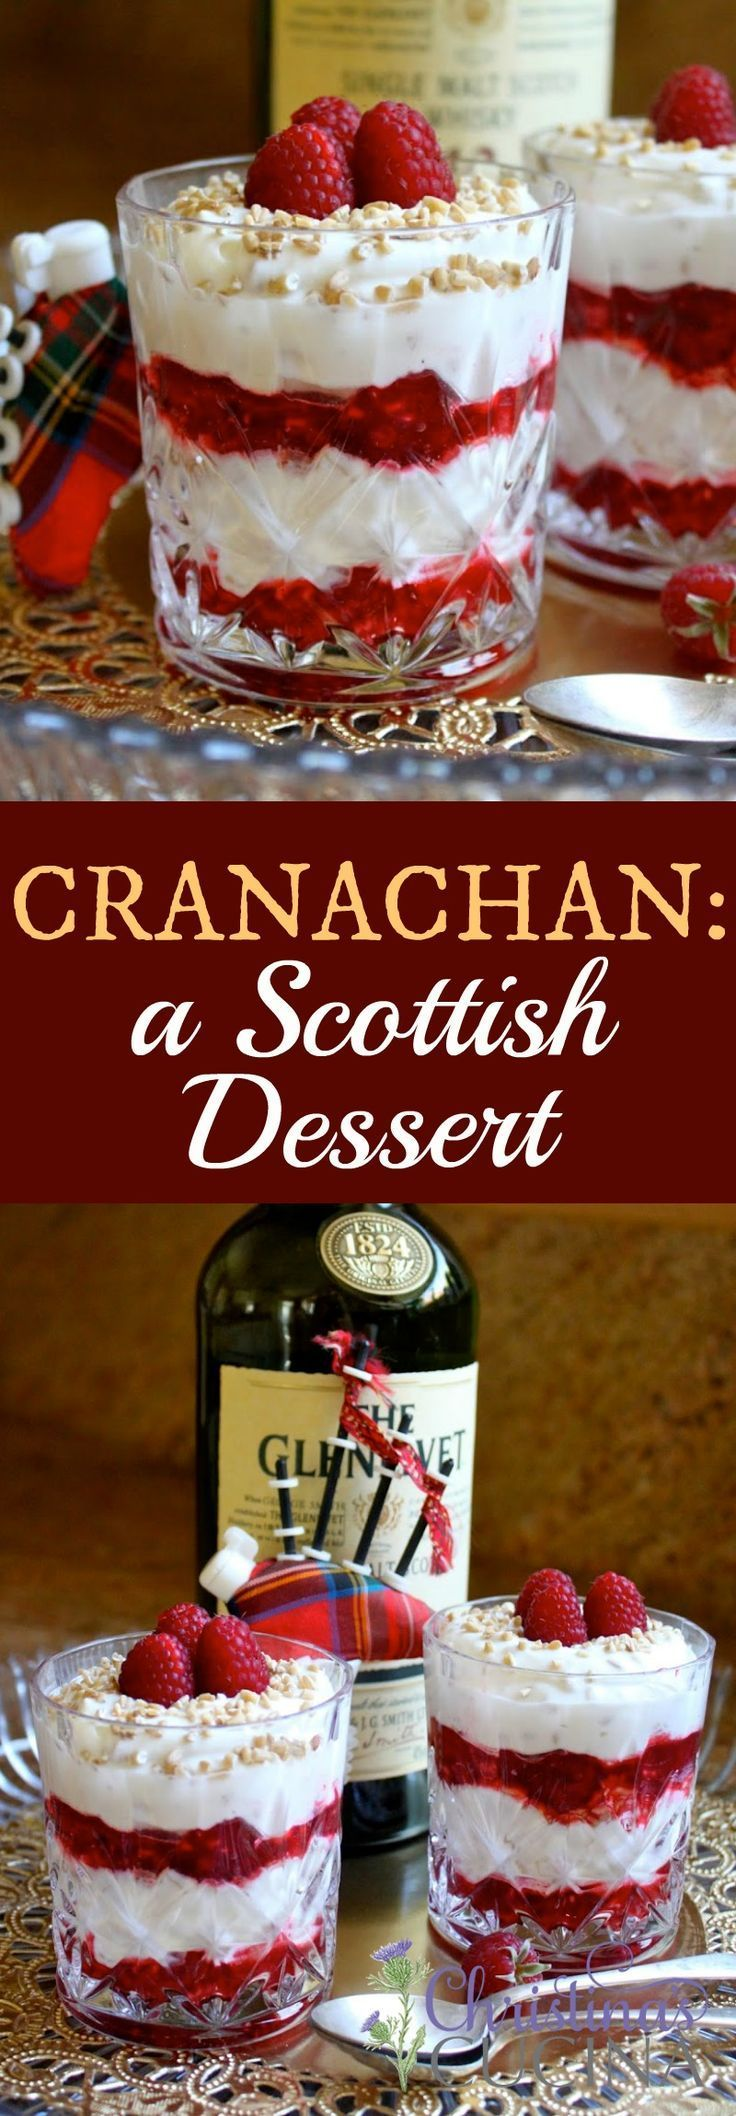 Best 25+ Cranachan recipe ideas on Pinterest | Burns night ...